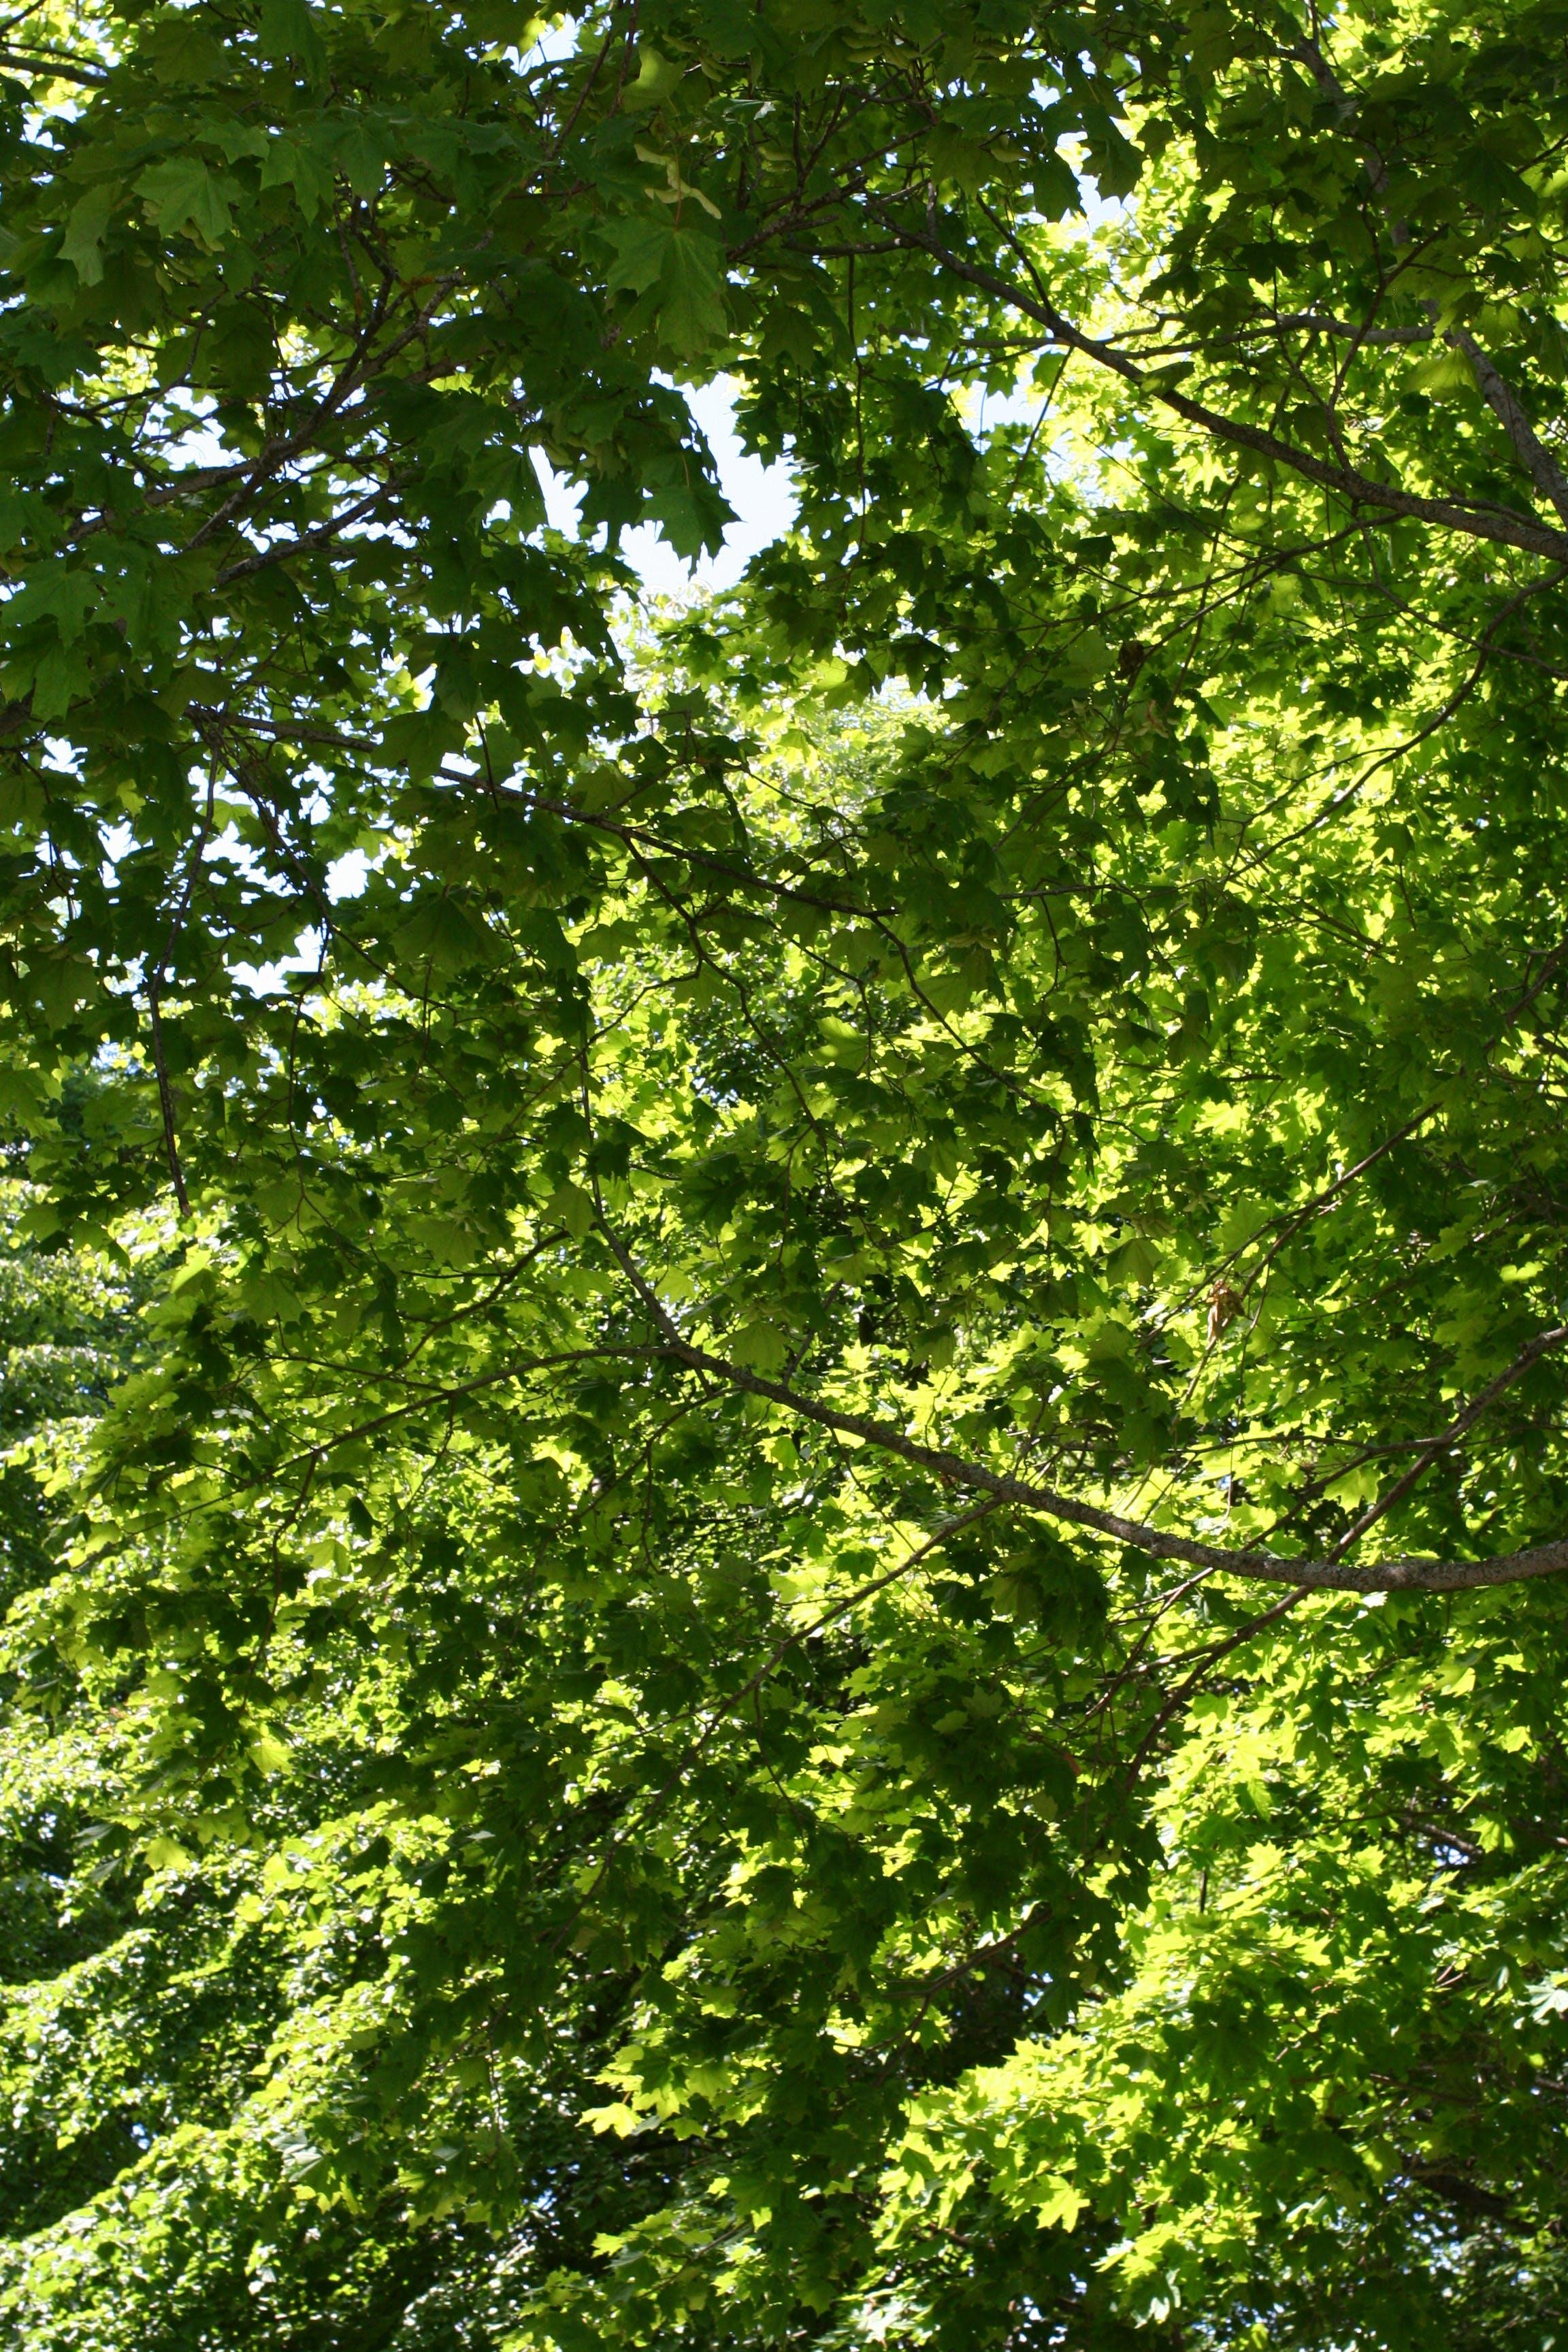 Fotos de stock gratuitas de #naturaleza, verano, verde